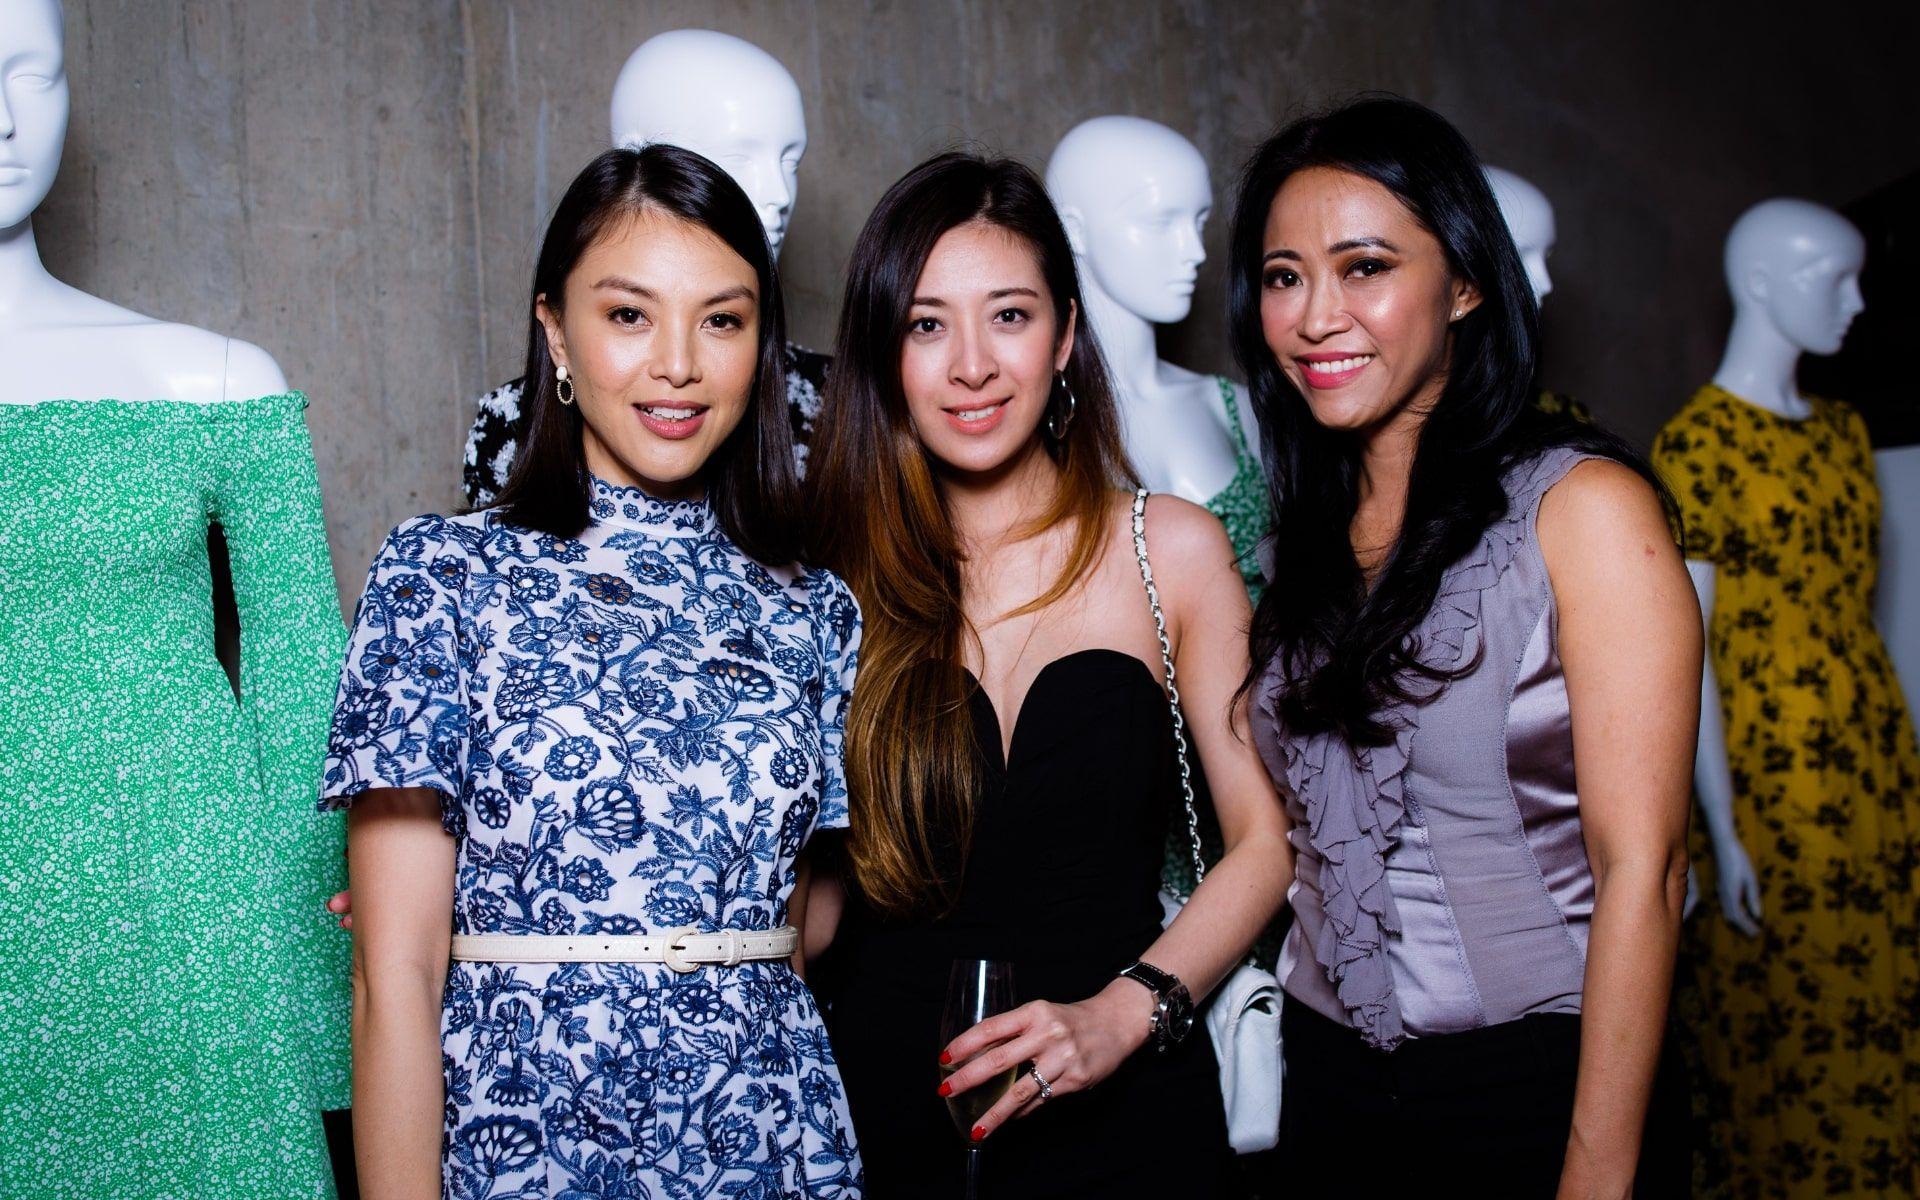 Carmen Soo, Elizabeth Thea and Rozie Mastor